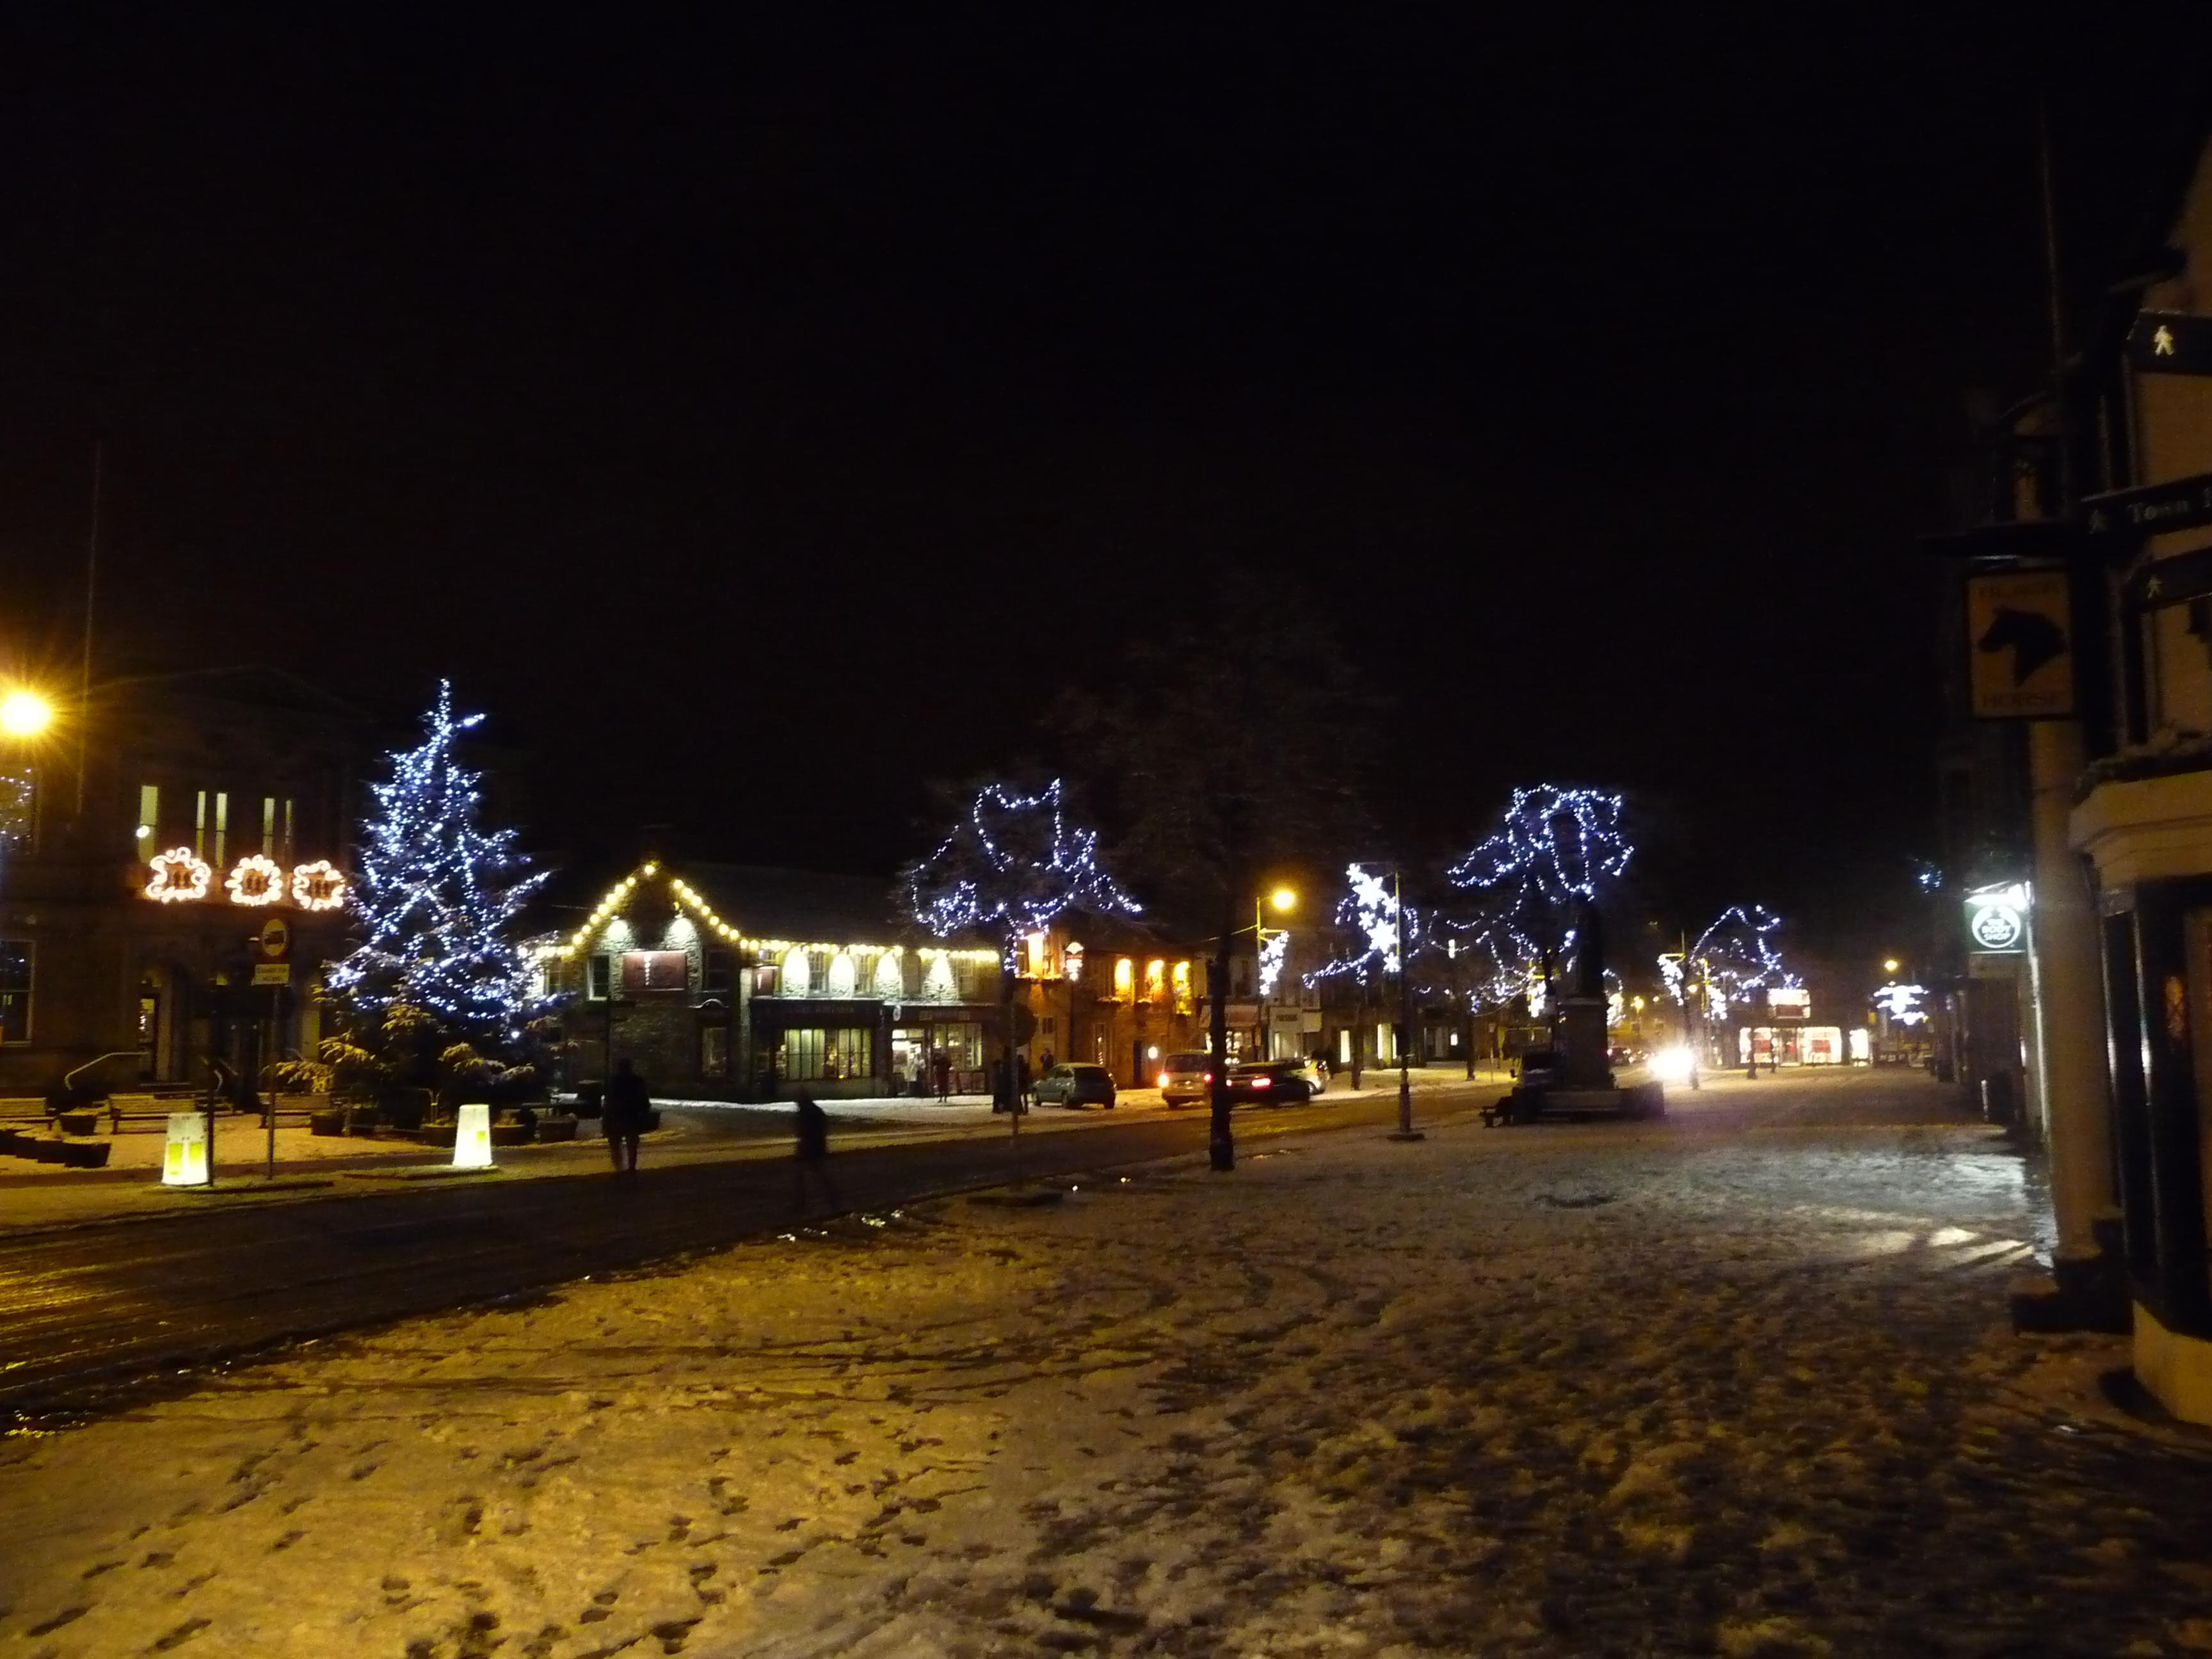 File:Christmas lights on Skipton High Street.JPG - Wikimedia Commons